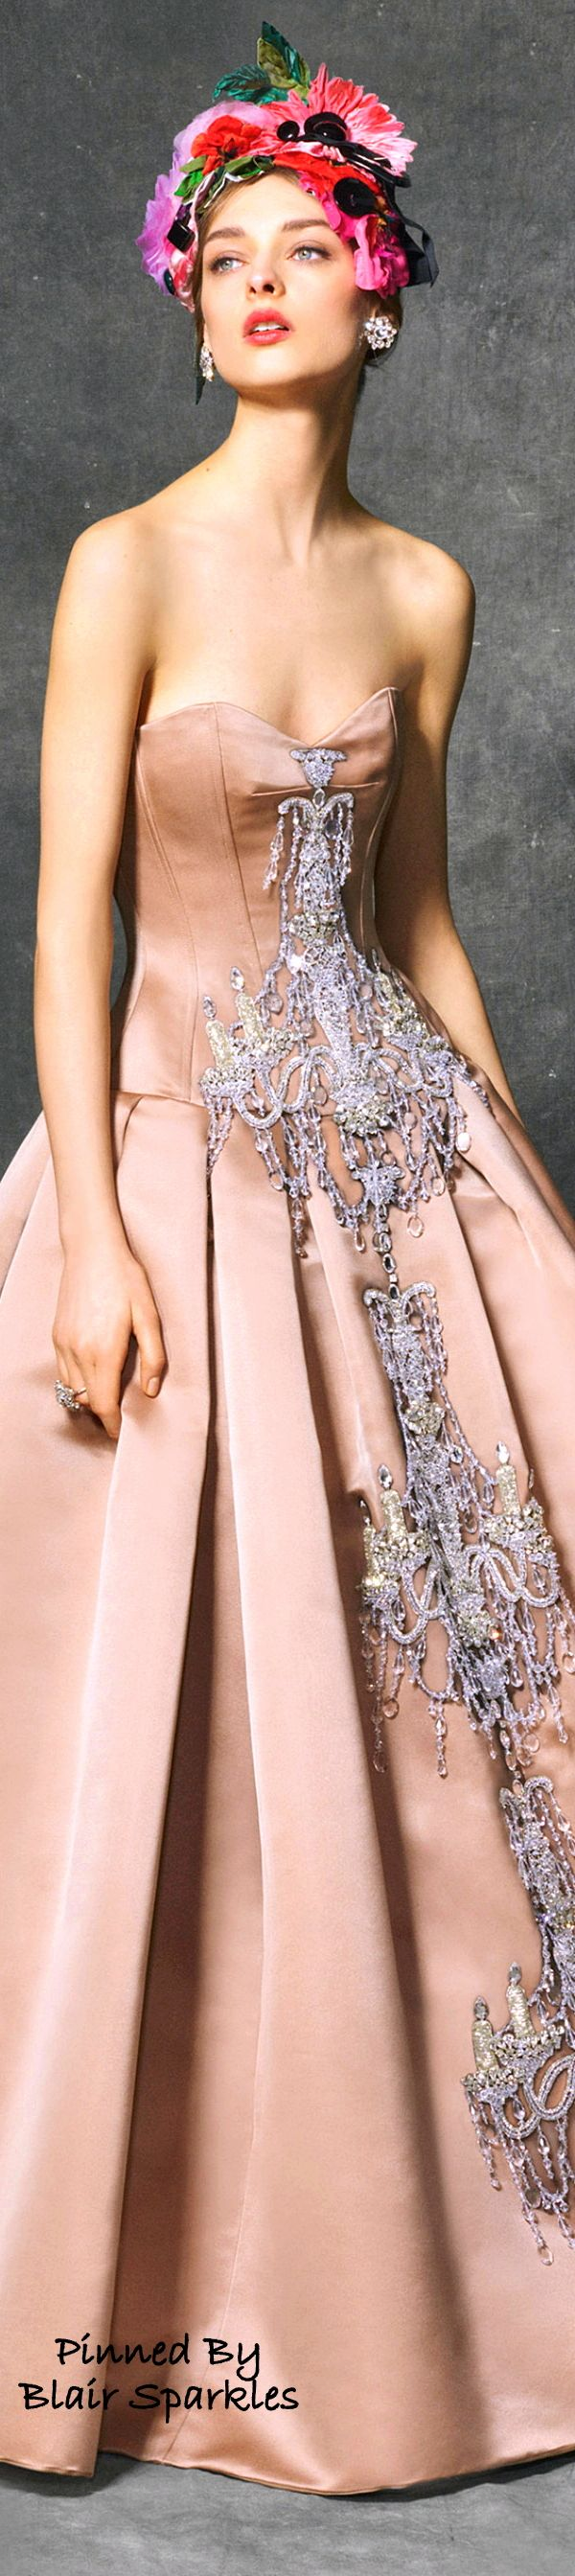 Dolce & Gabbana WINTER 2017 MODERN PRINCESS ~ ♕♚εїз | BLAIR ...